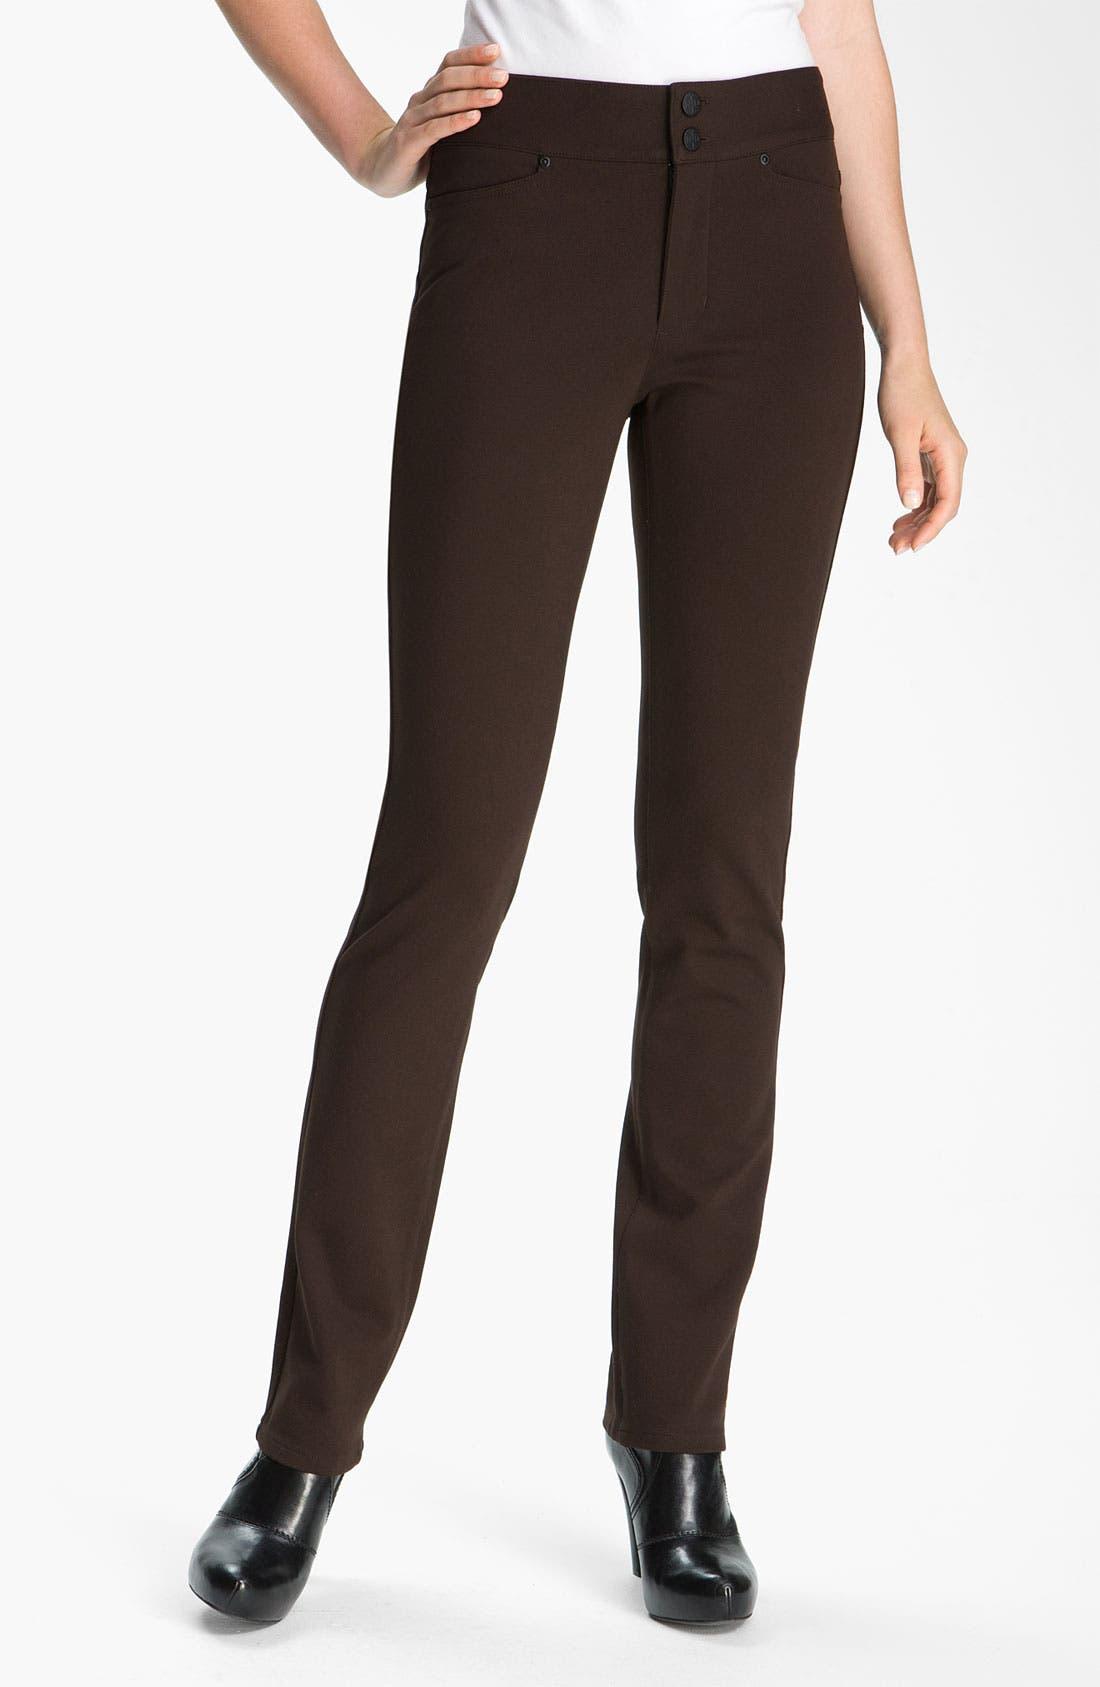 Alternate Image 2  - NYDJ 'Natasha' Skinny Ponte Pants (Petite)